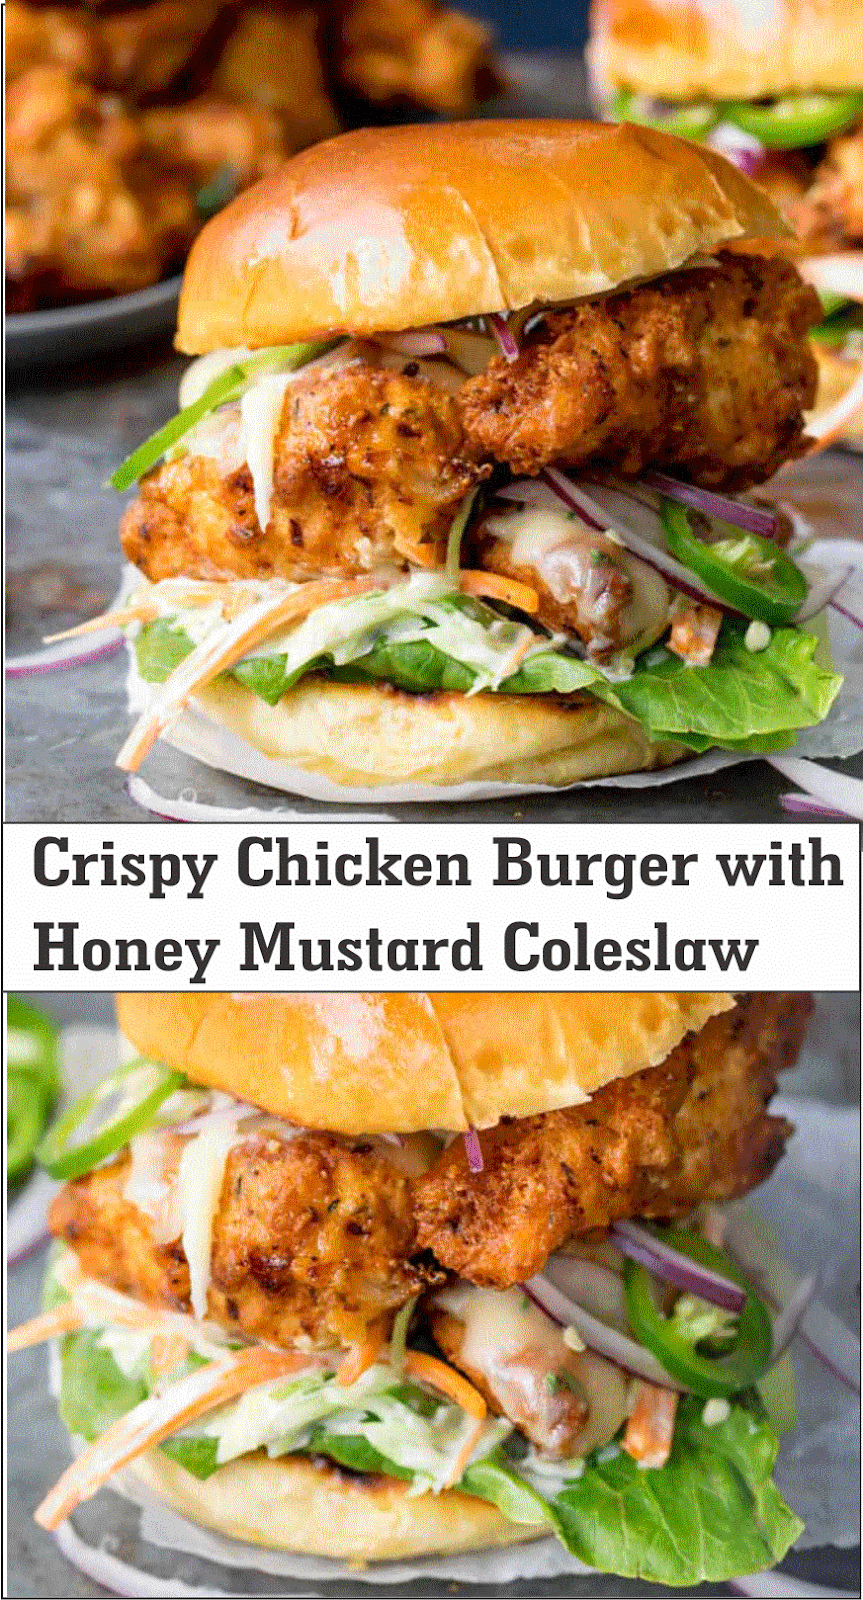 Crispy Chicken Burger With Honey Mustard Coleslaw Crispy Chicken Burgers Recipes Cooking Recipes